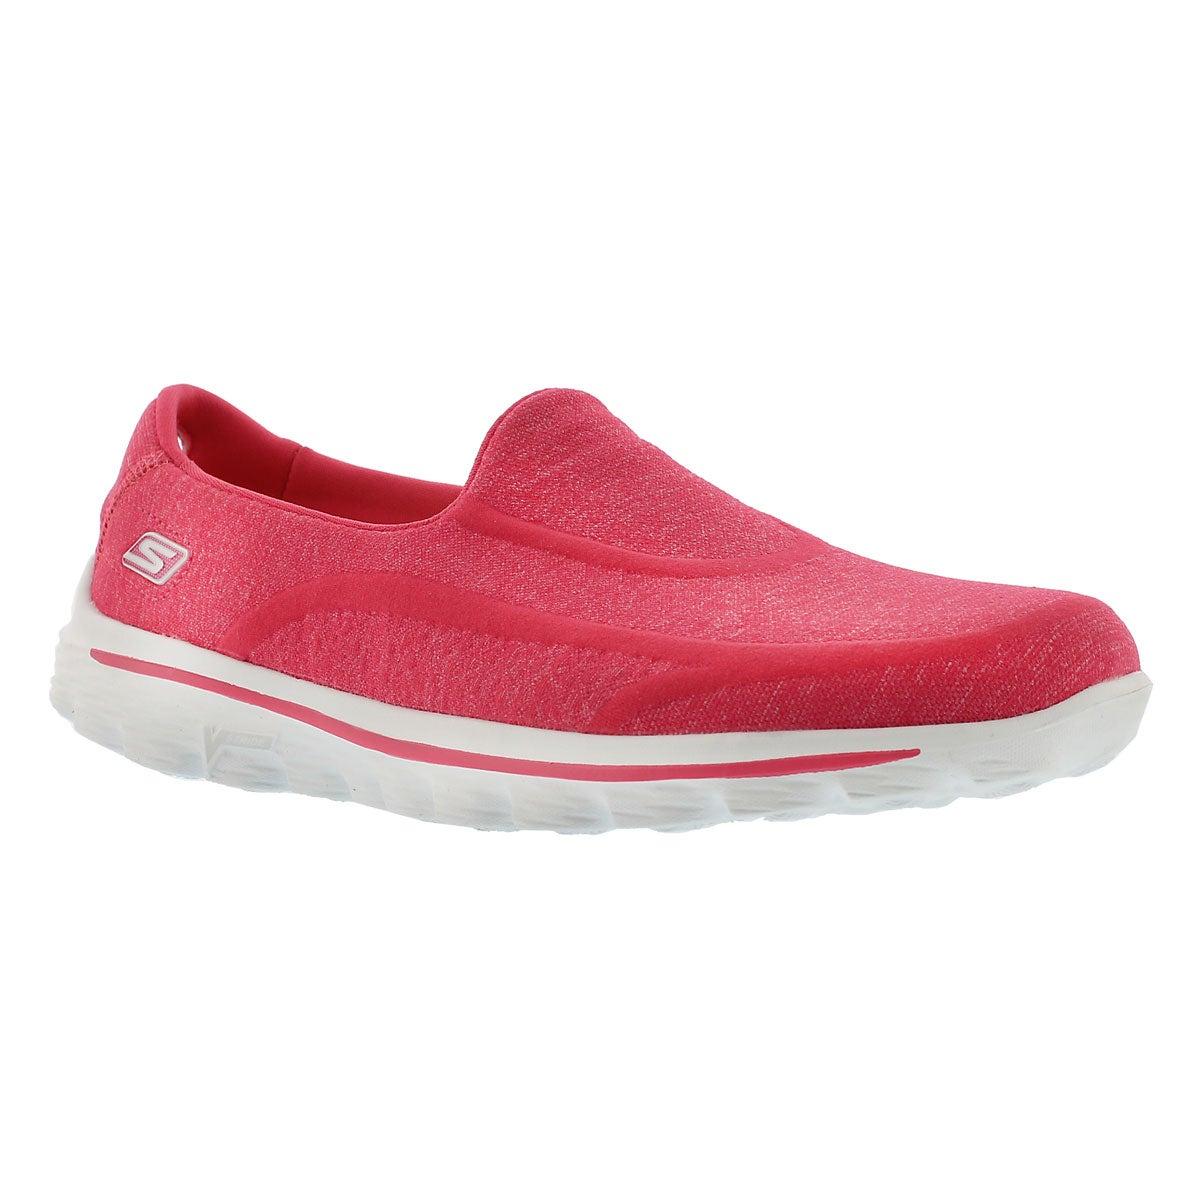 Lds GOwalk Super Sock pink slip on